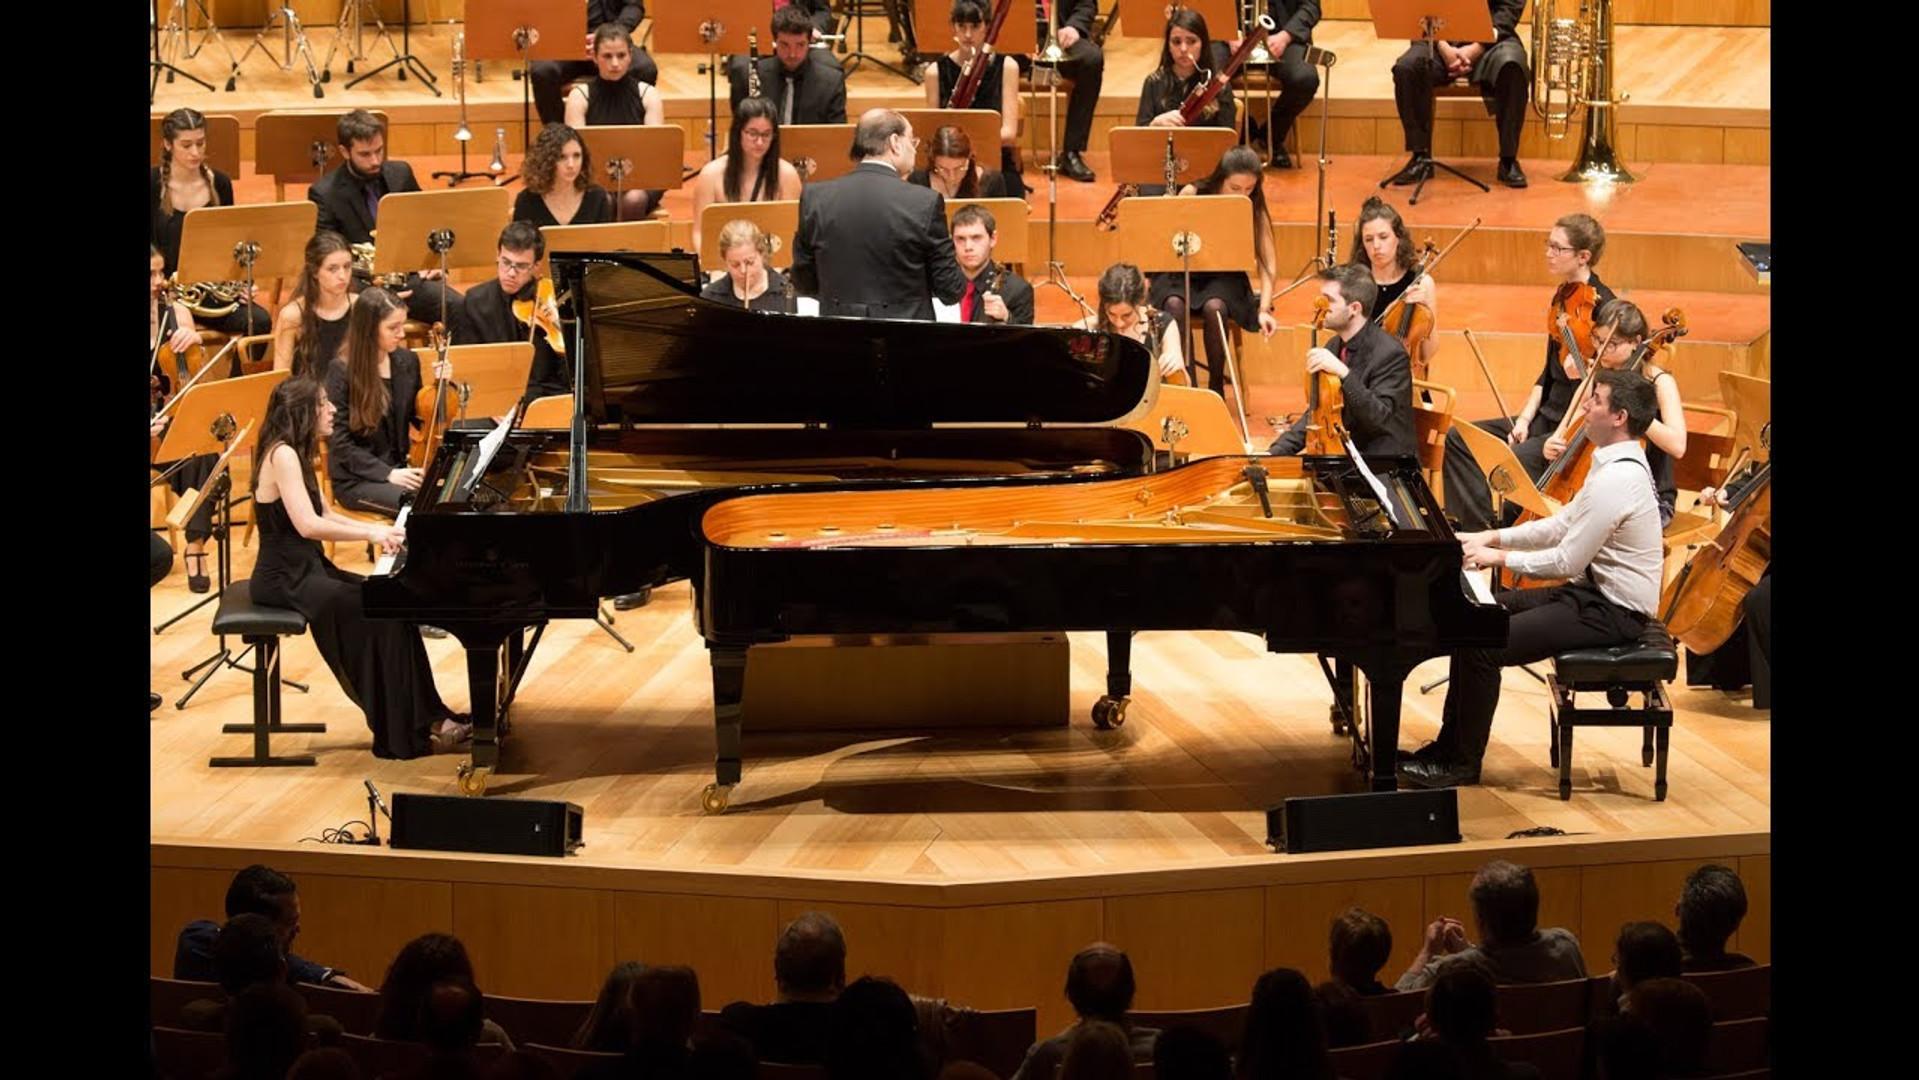 F. Poulenc 2 pianos Concerto